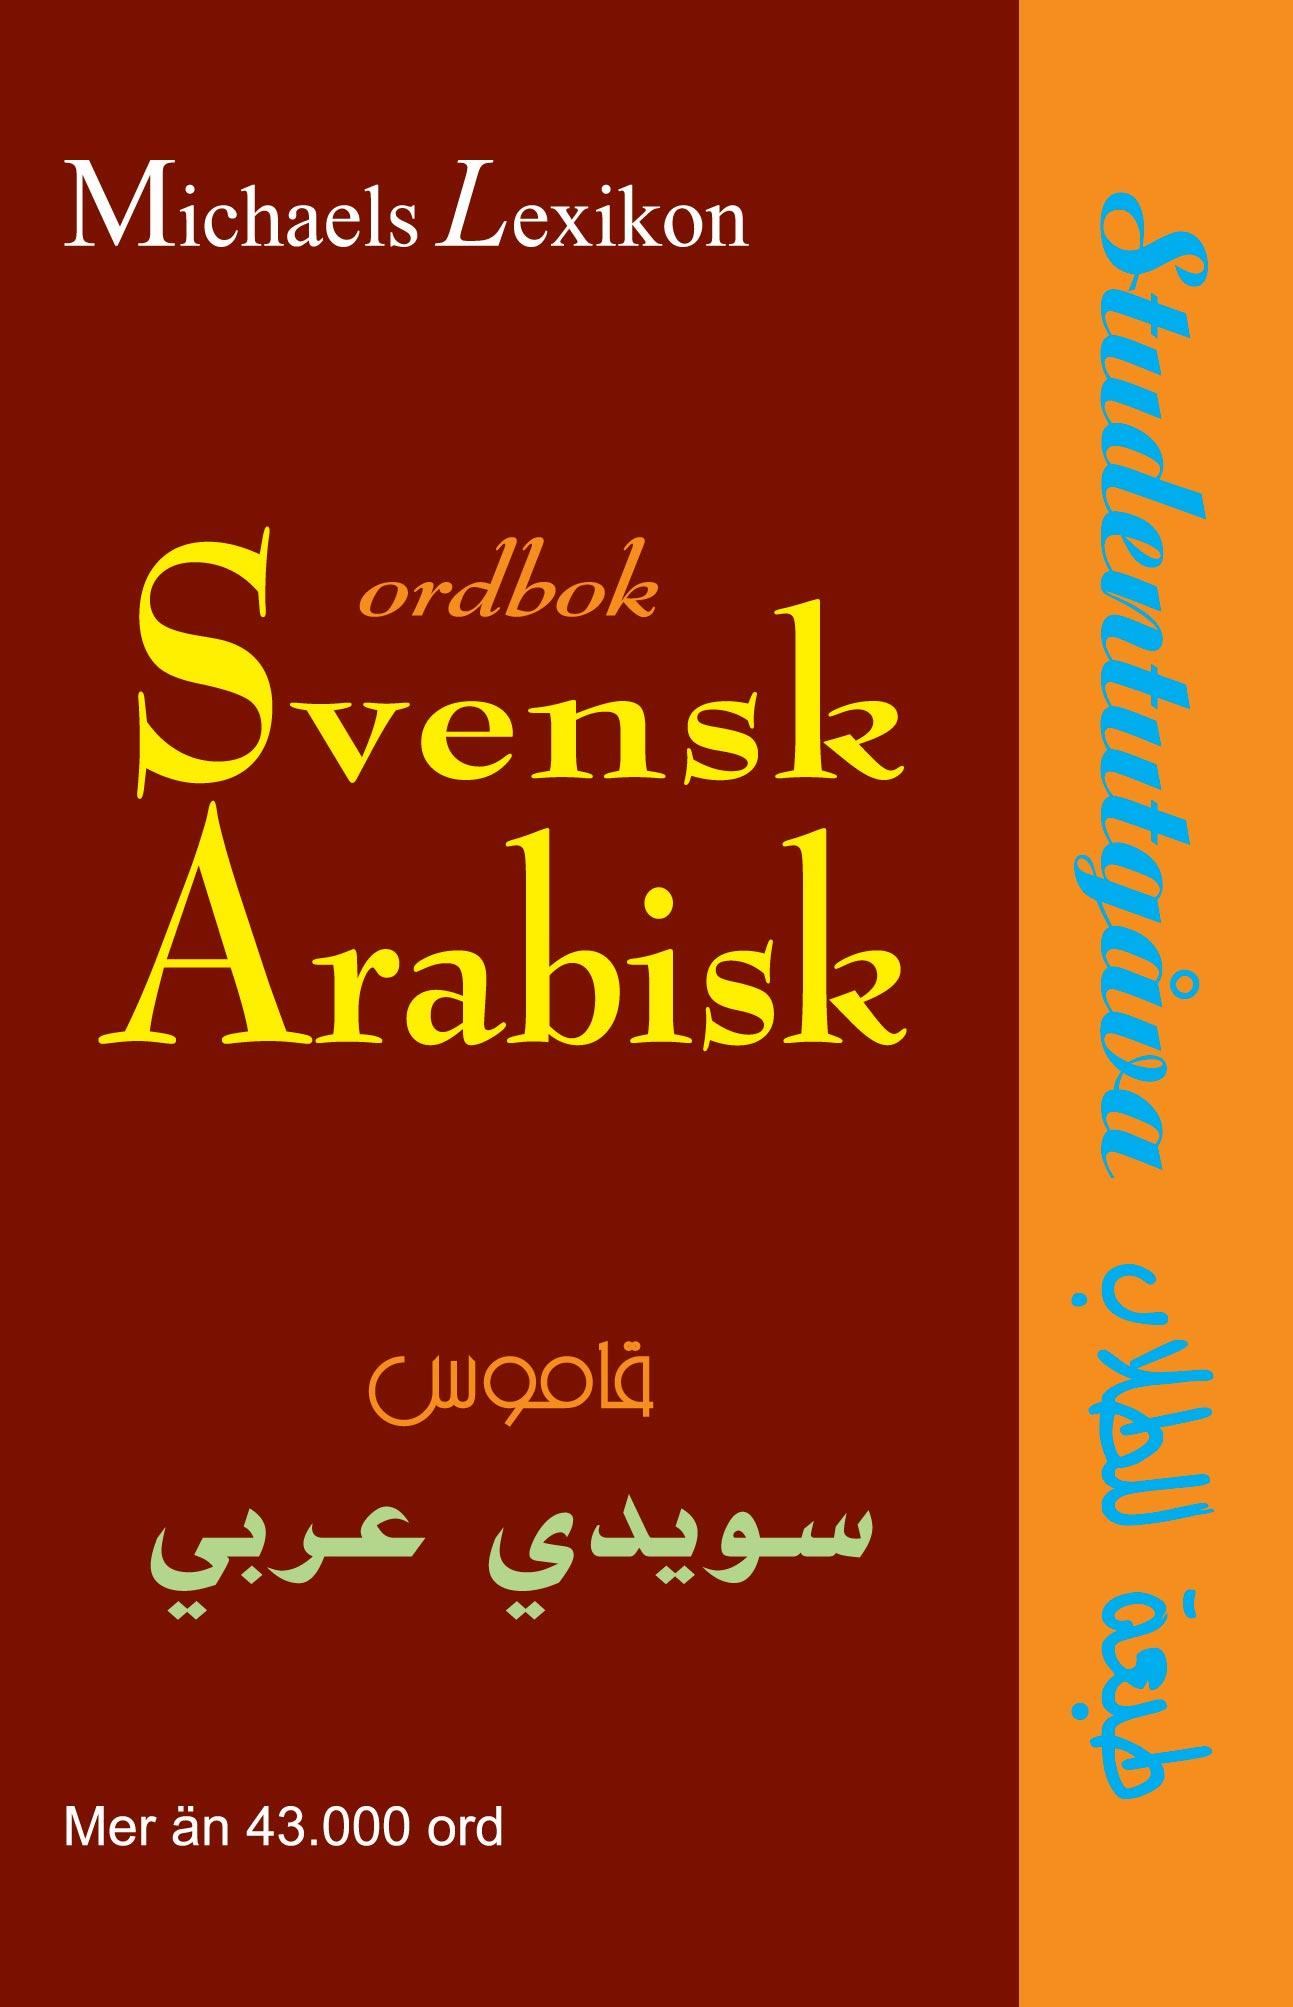 Svensk-arabisk ordbok - Studentutgåva